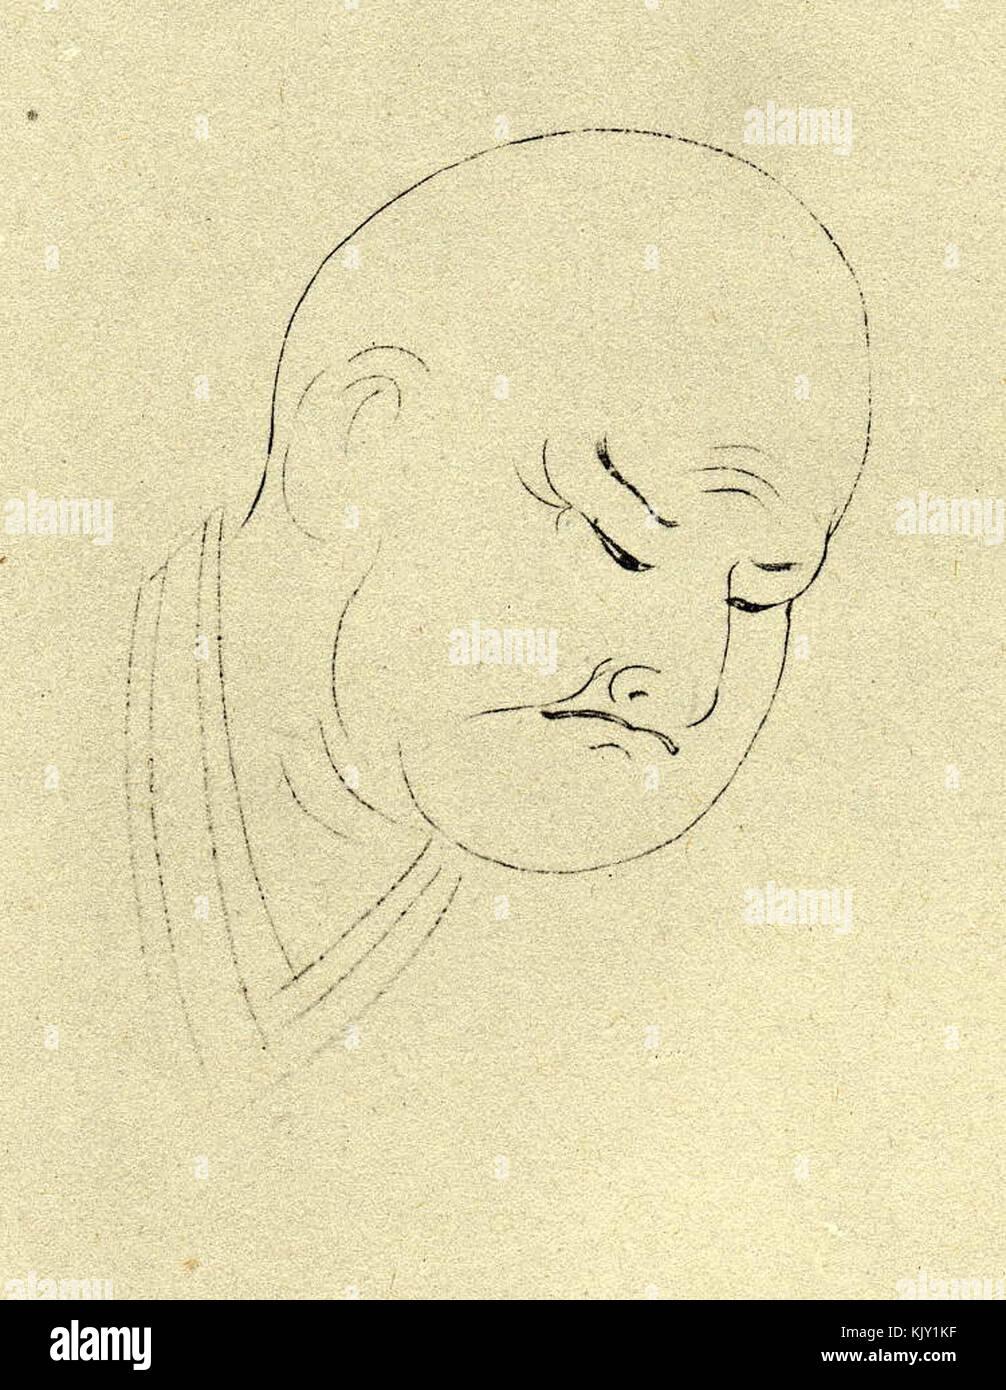 Takarai Kikaku matsuo bashō